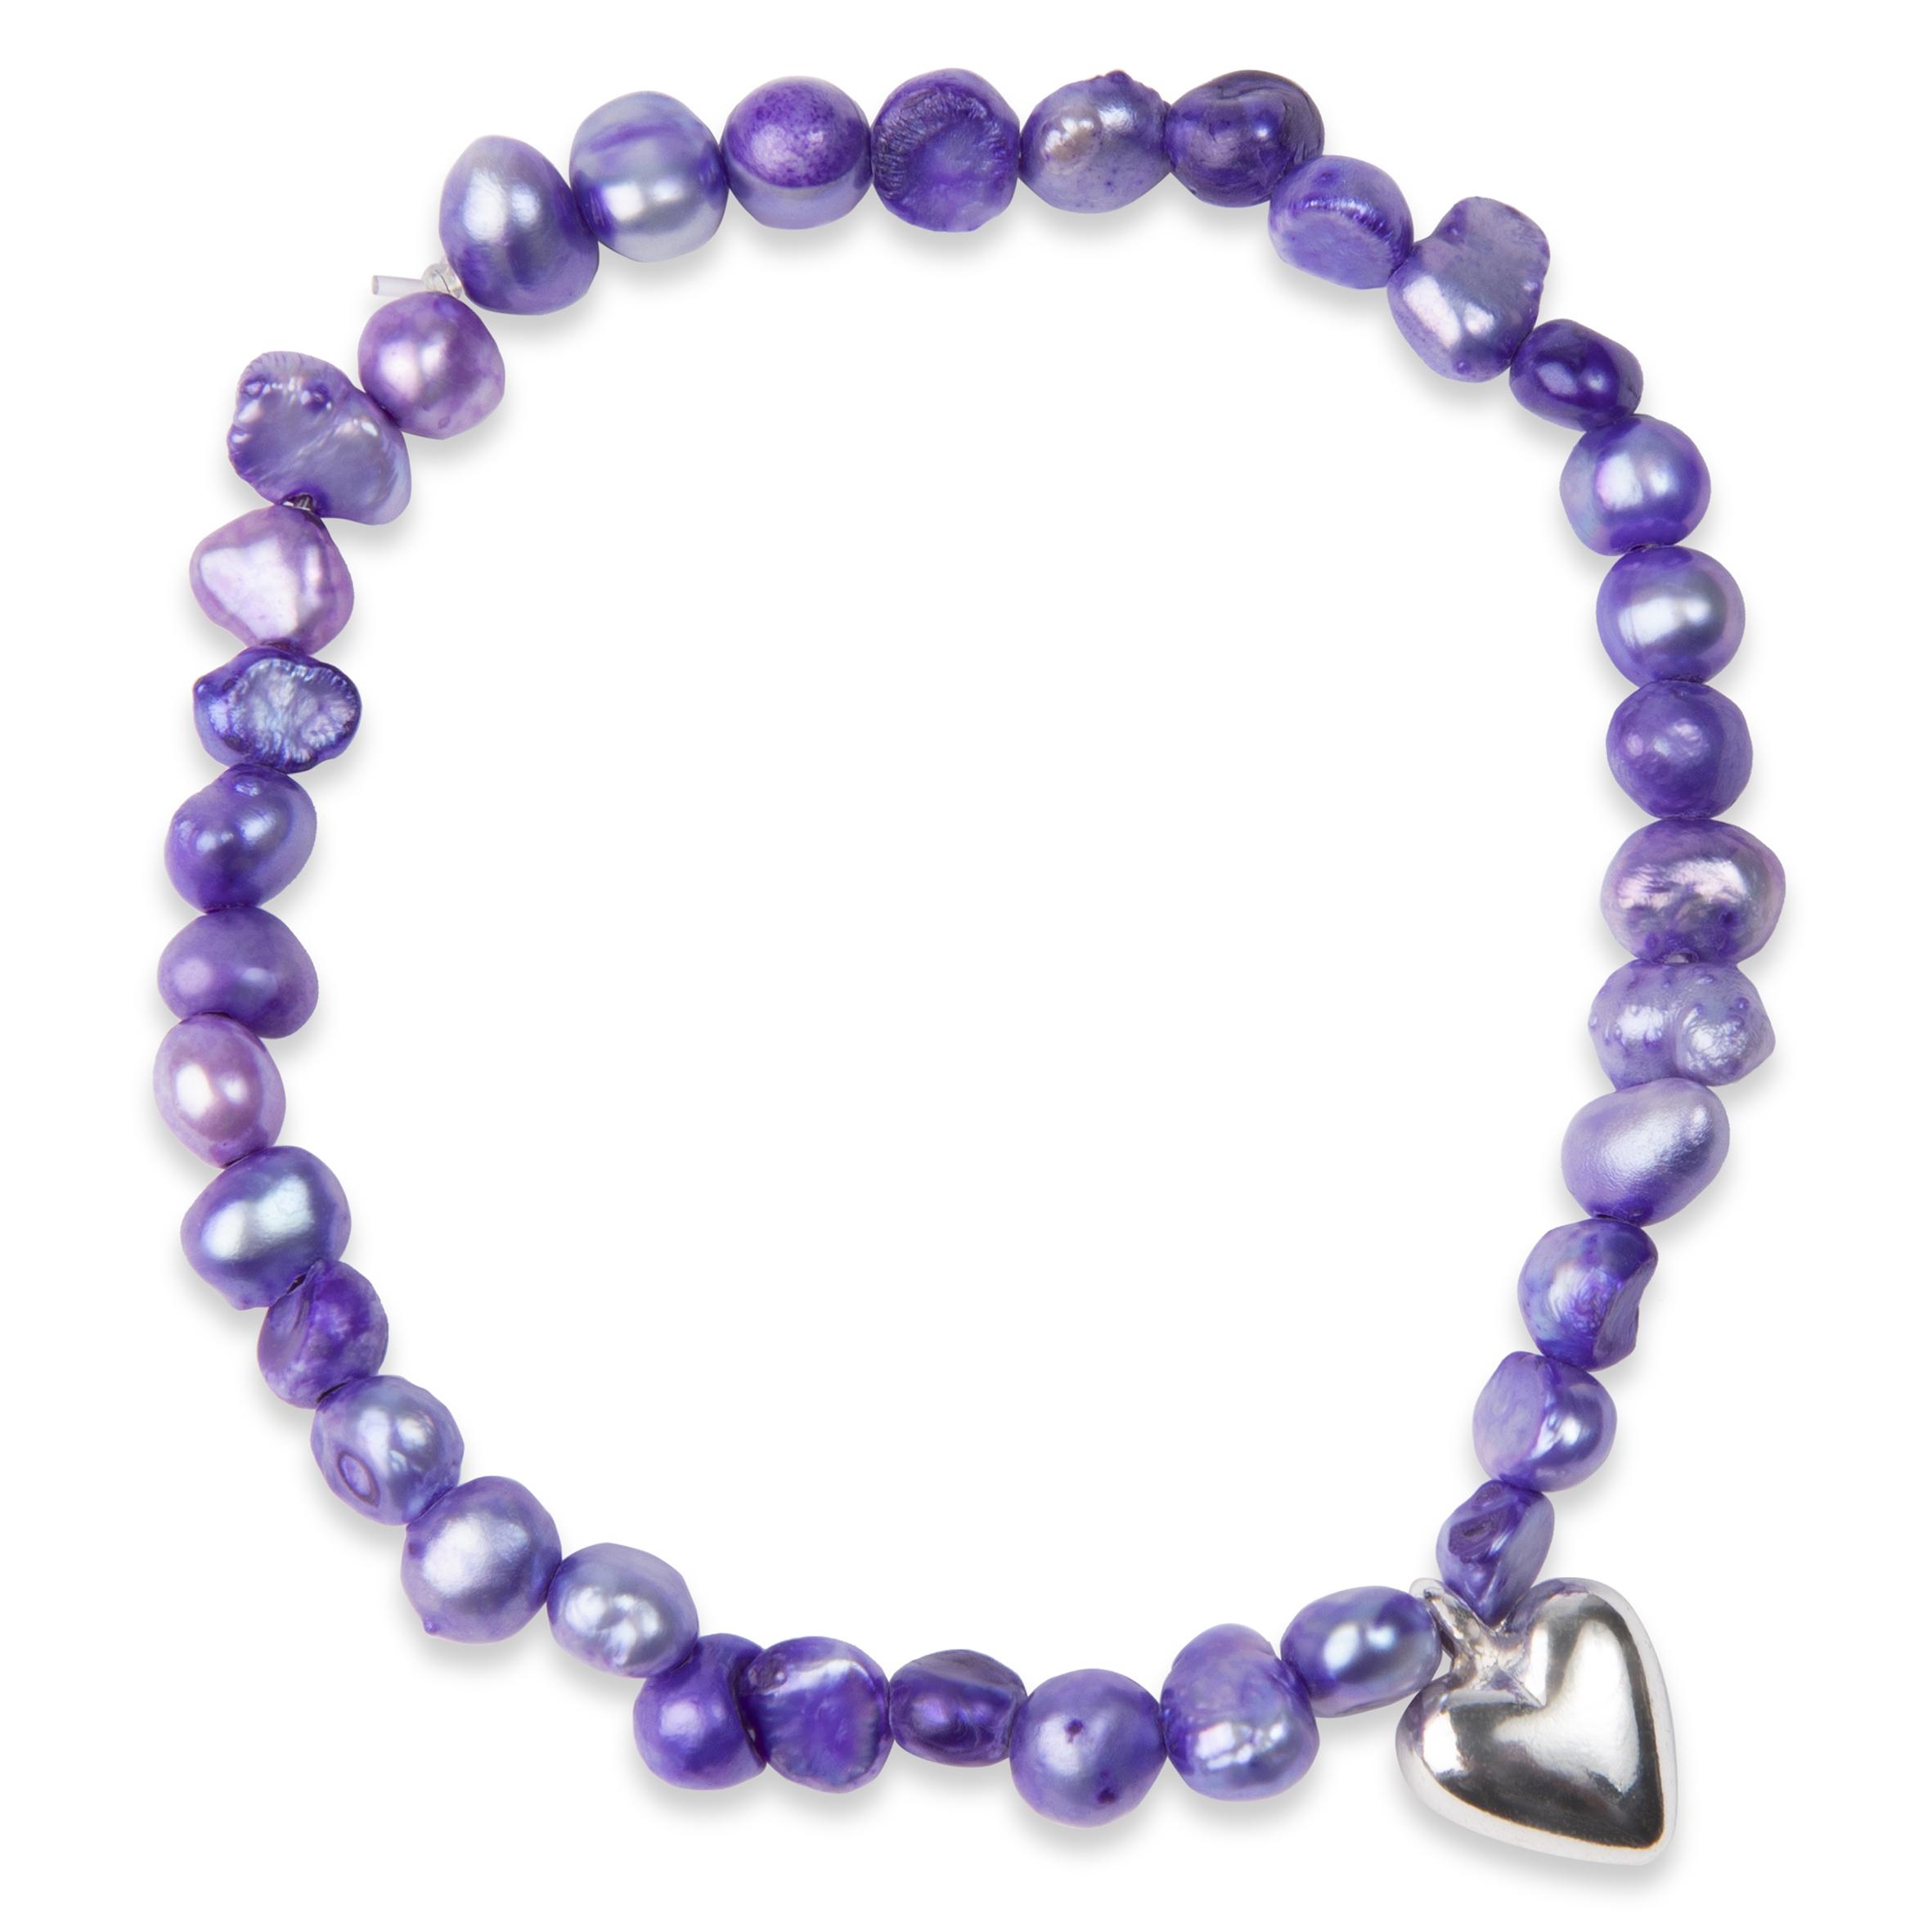 Barnsmycke pfg Stockholm Pearls Kids-Holly Bracelet 11001-10